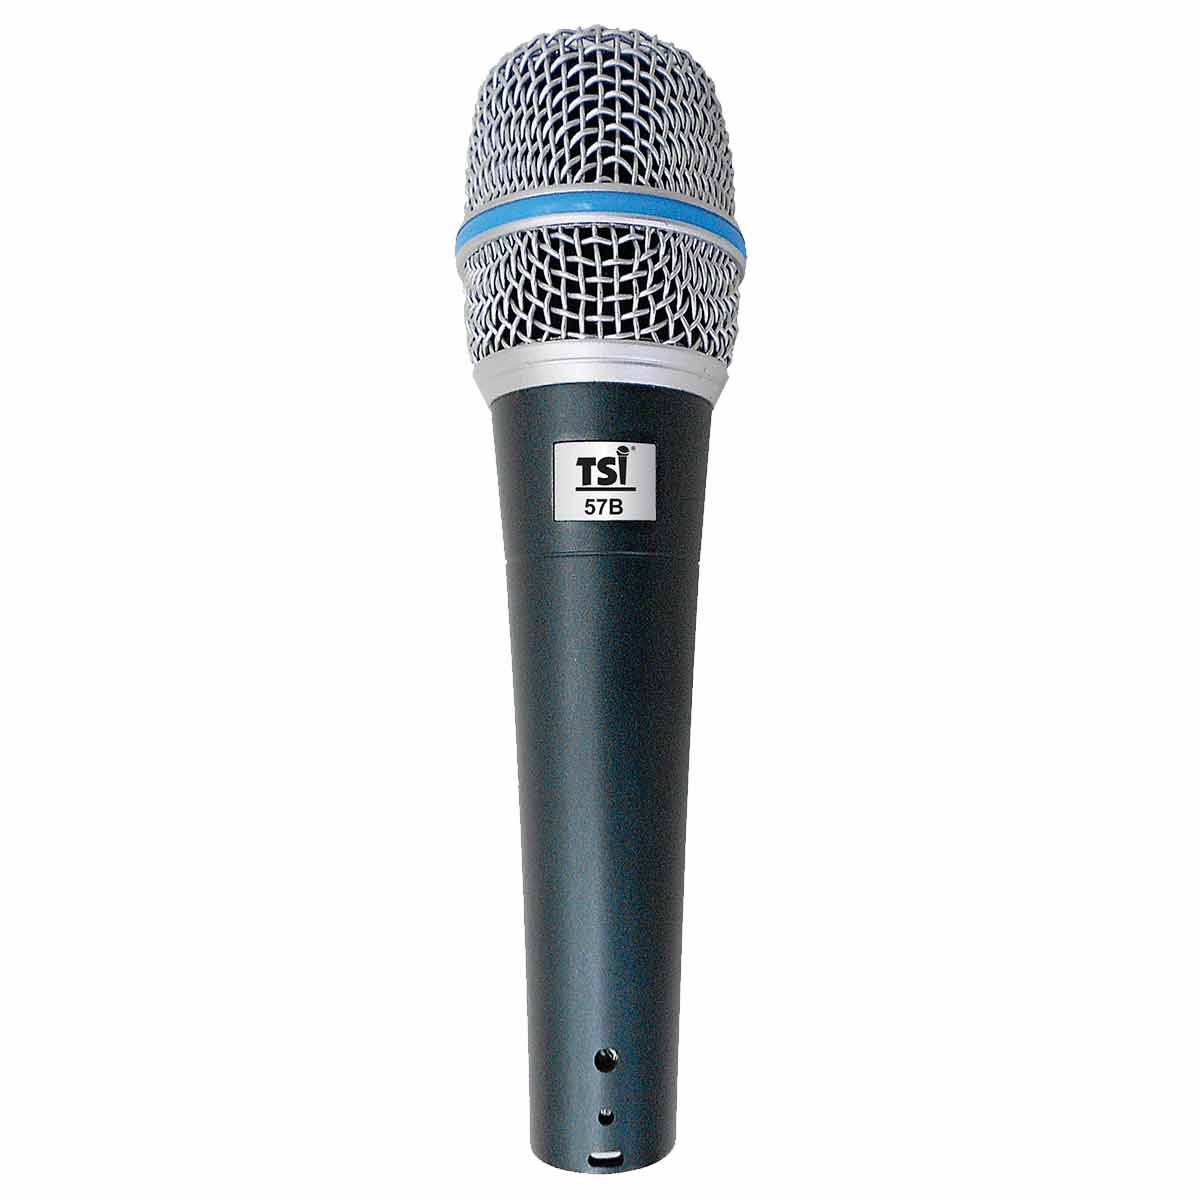 Microfone c/ Fio de Mão 57B - TSI